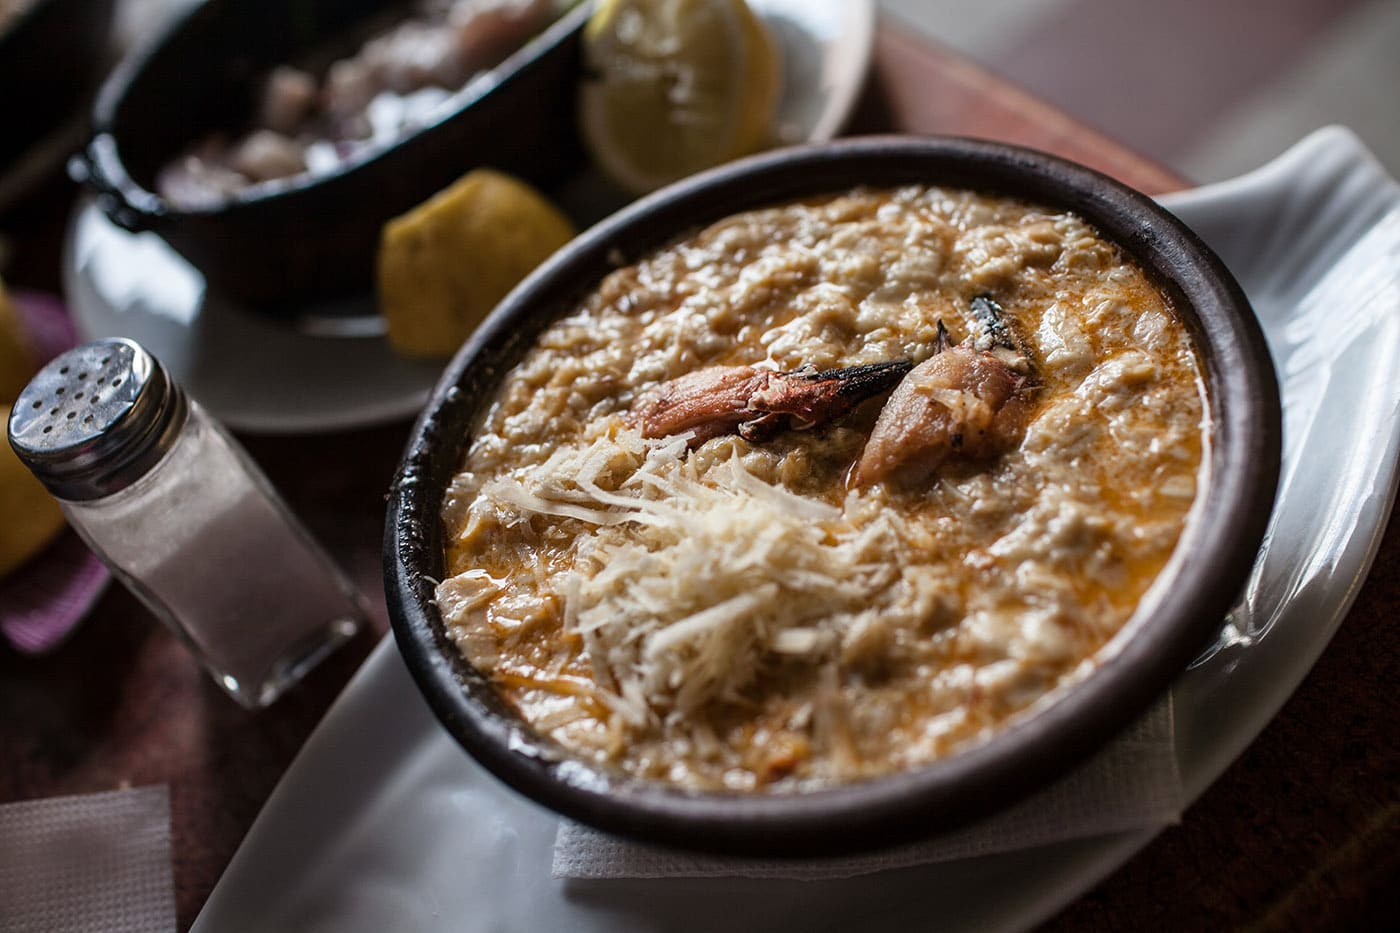 Pastel de Jaibas - crab casserole - in Santiago, Chile